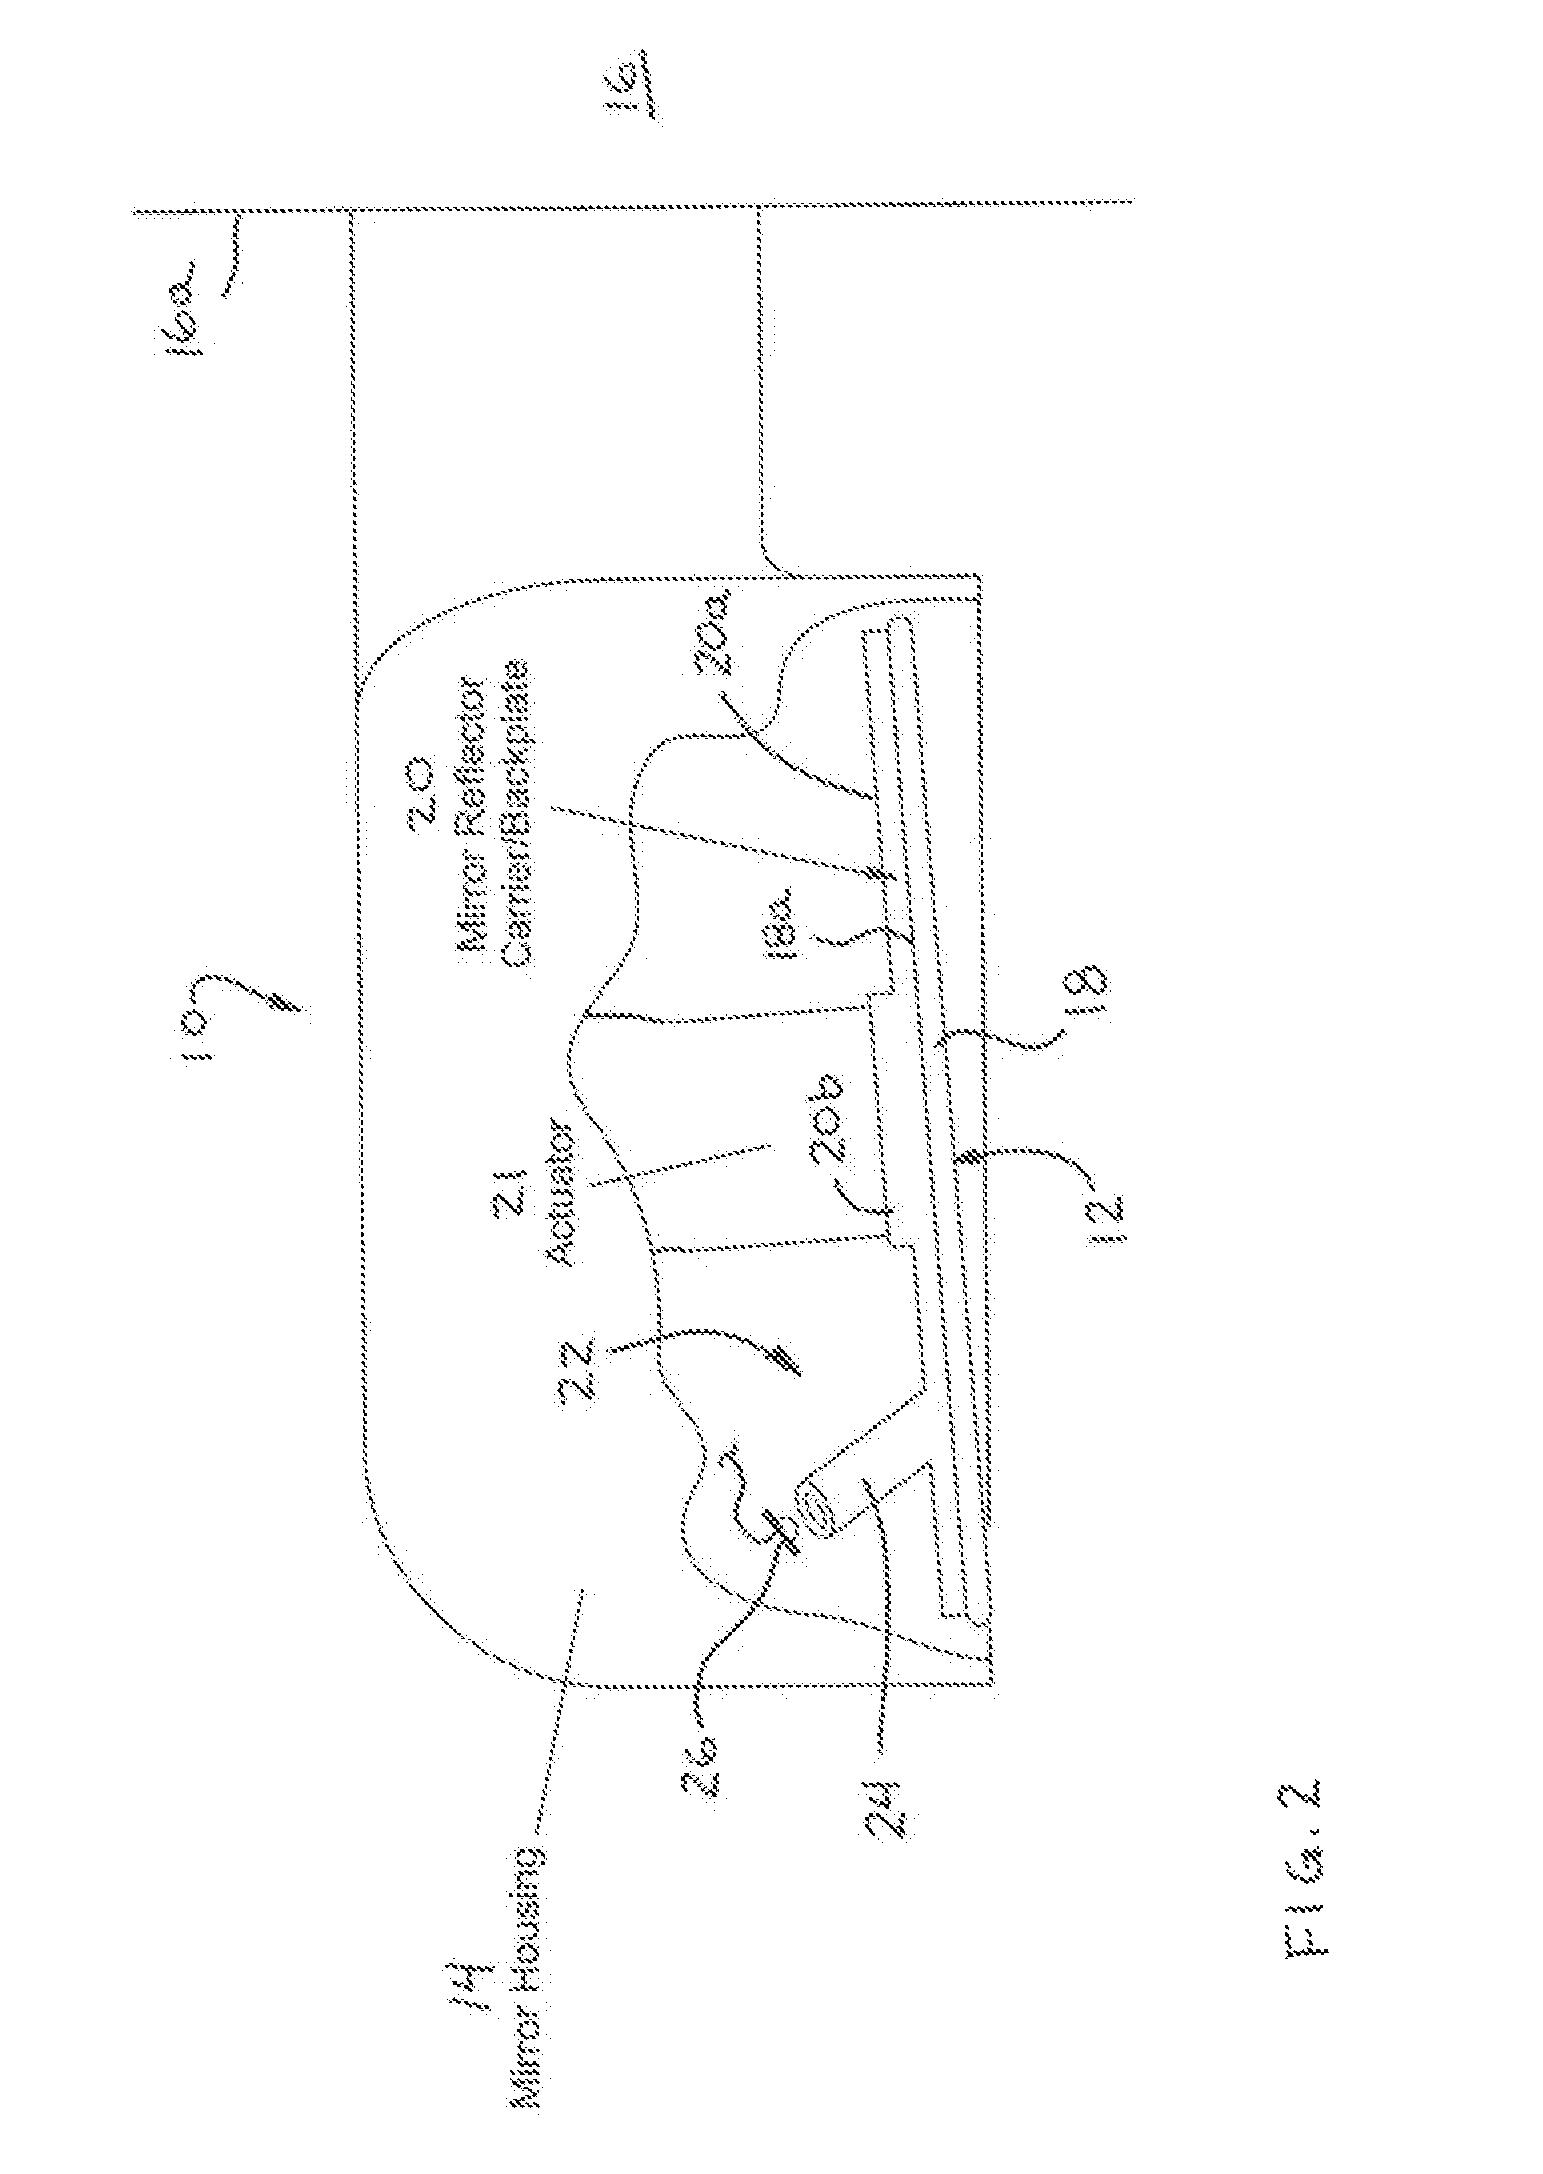 Patent US 9,045,091 B2 on